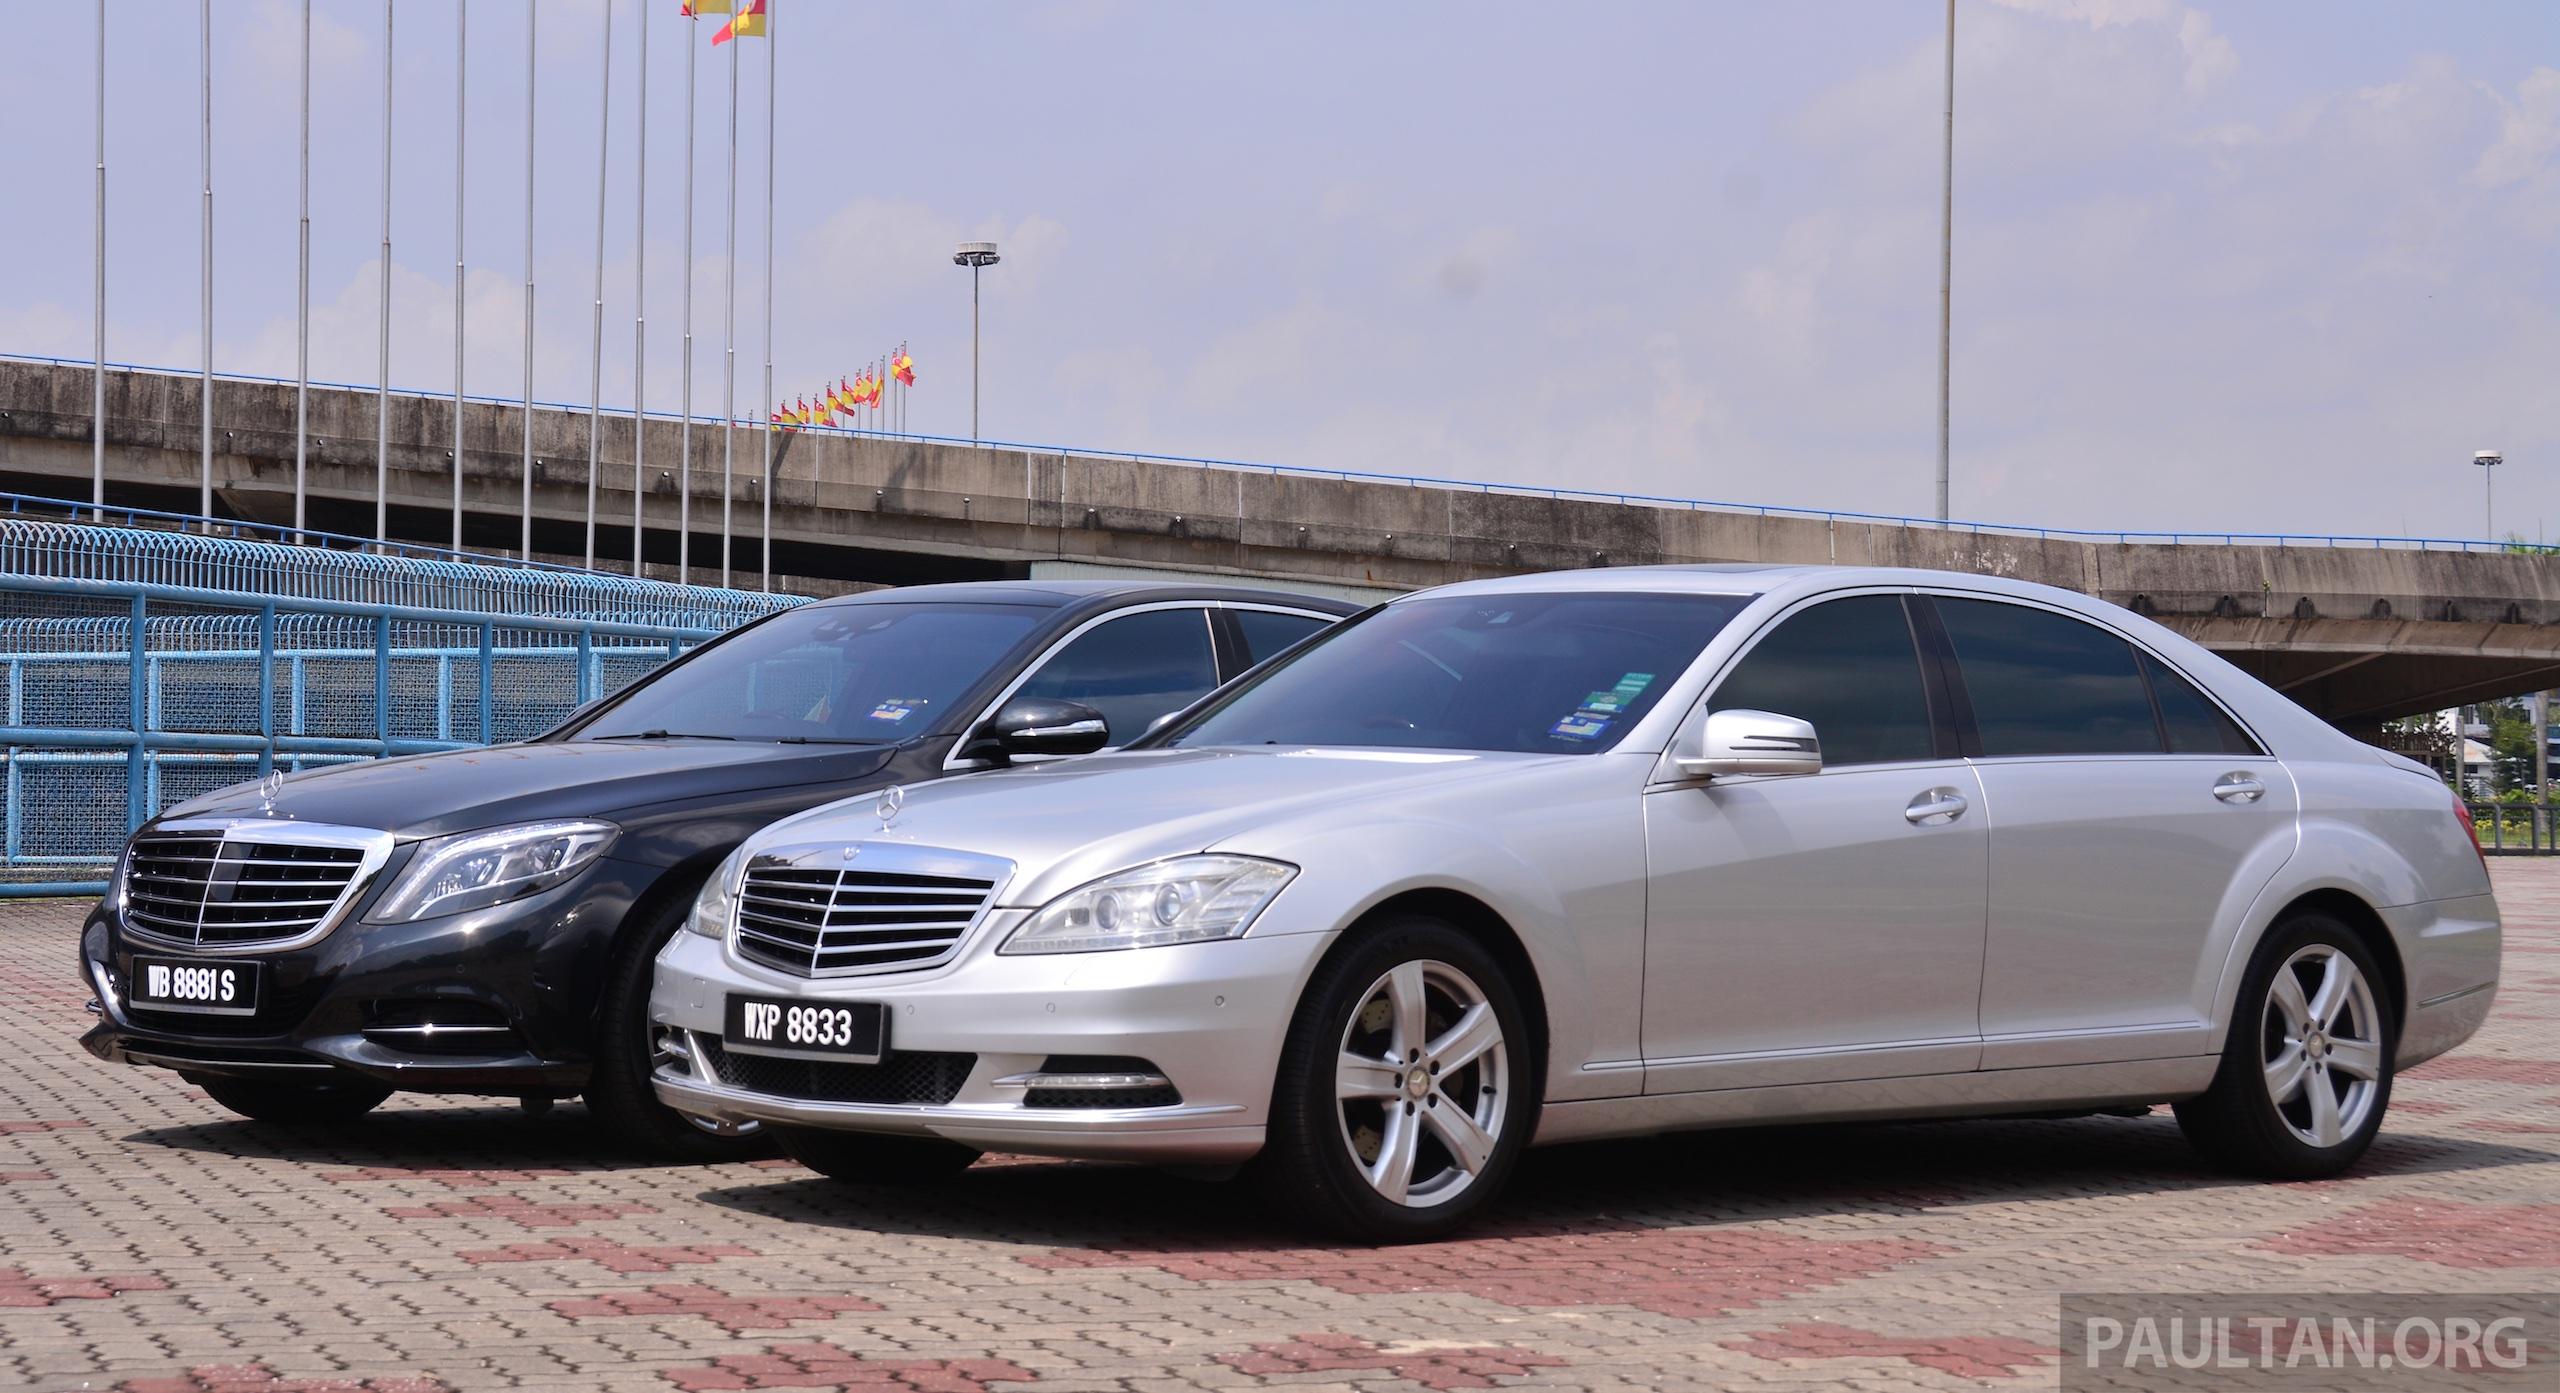 GALLERY: Mercedes-Benz S-Class – W222 vs W221 Image 371817